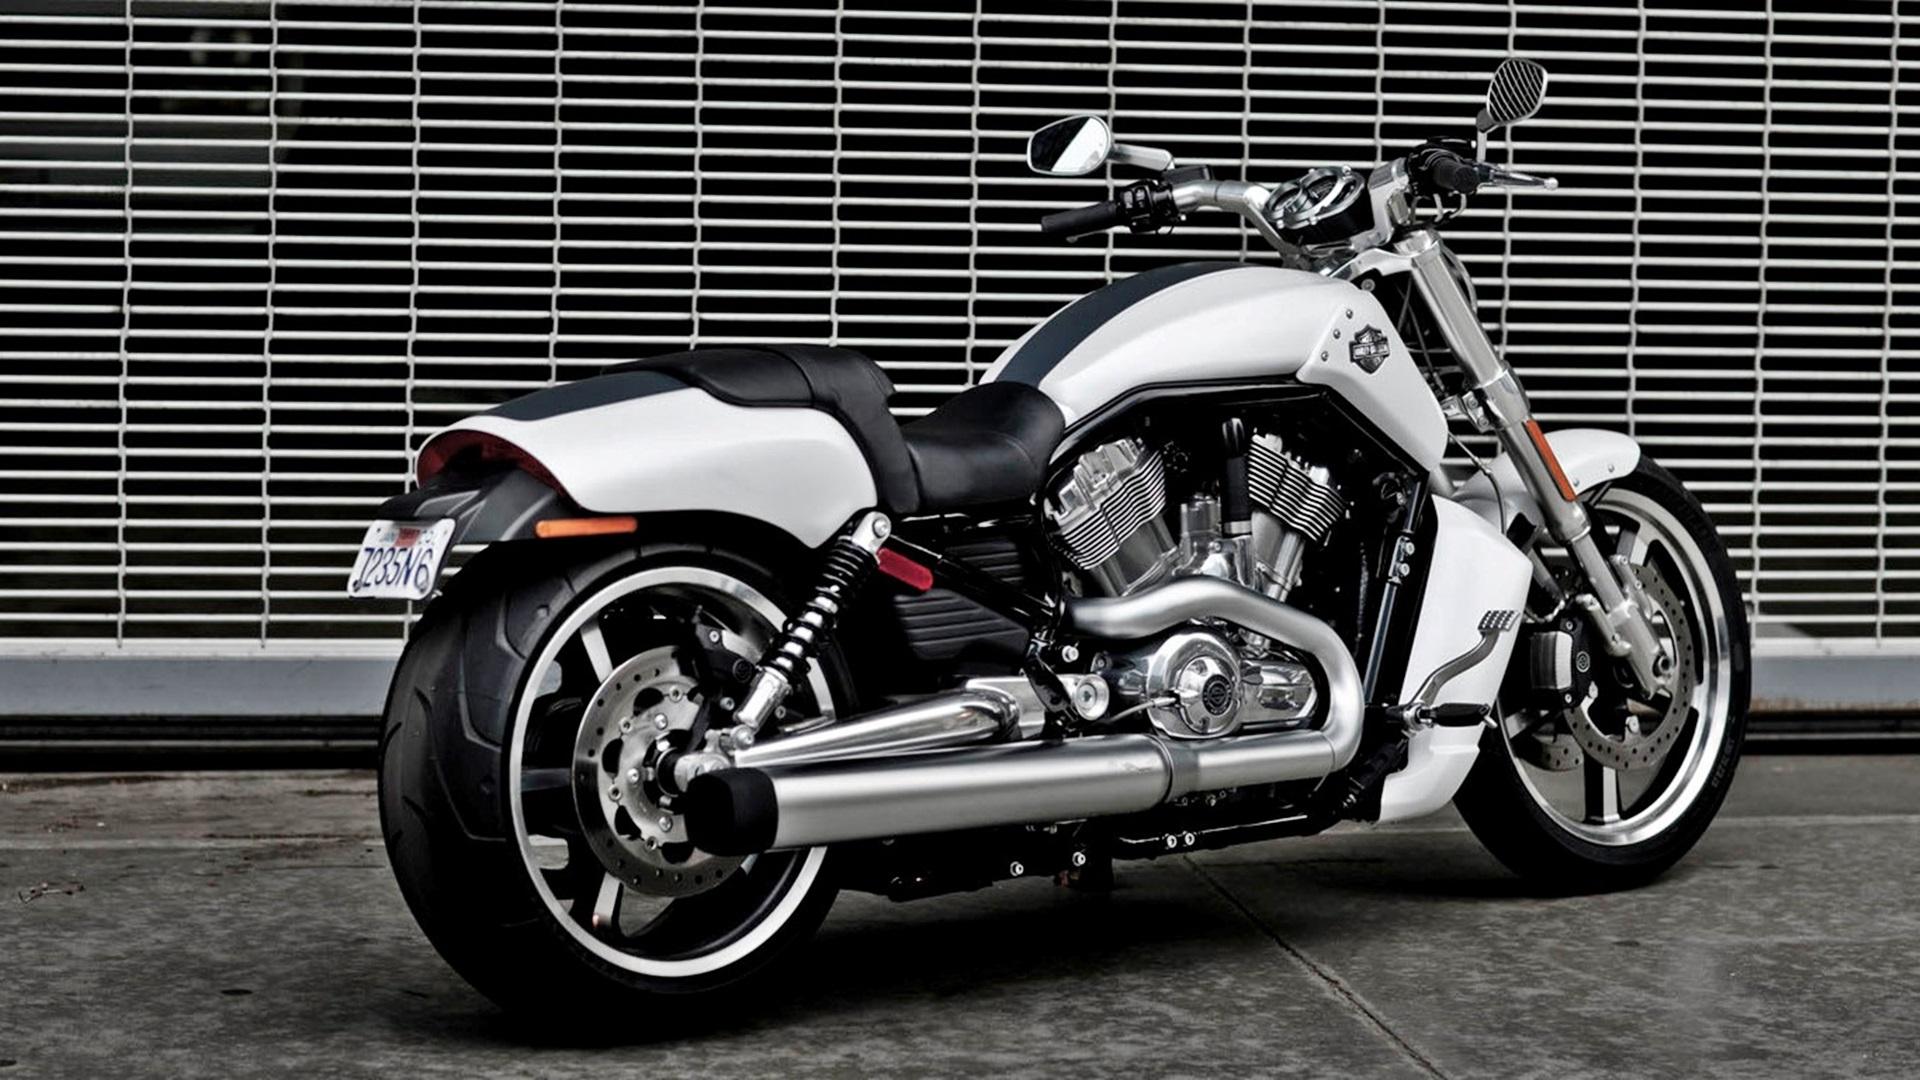 White Bike Harley Davidson Hd Wallpapers Harley Davidson V Rod